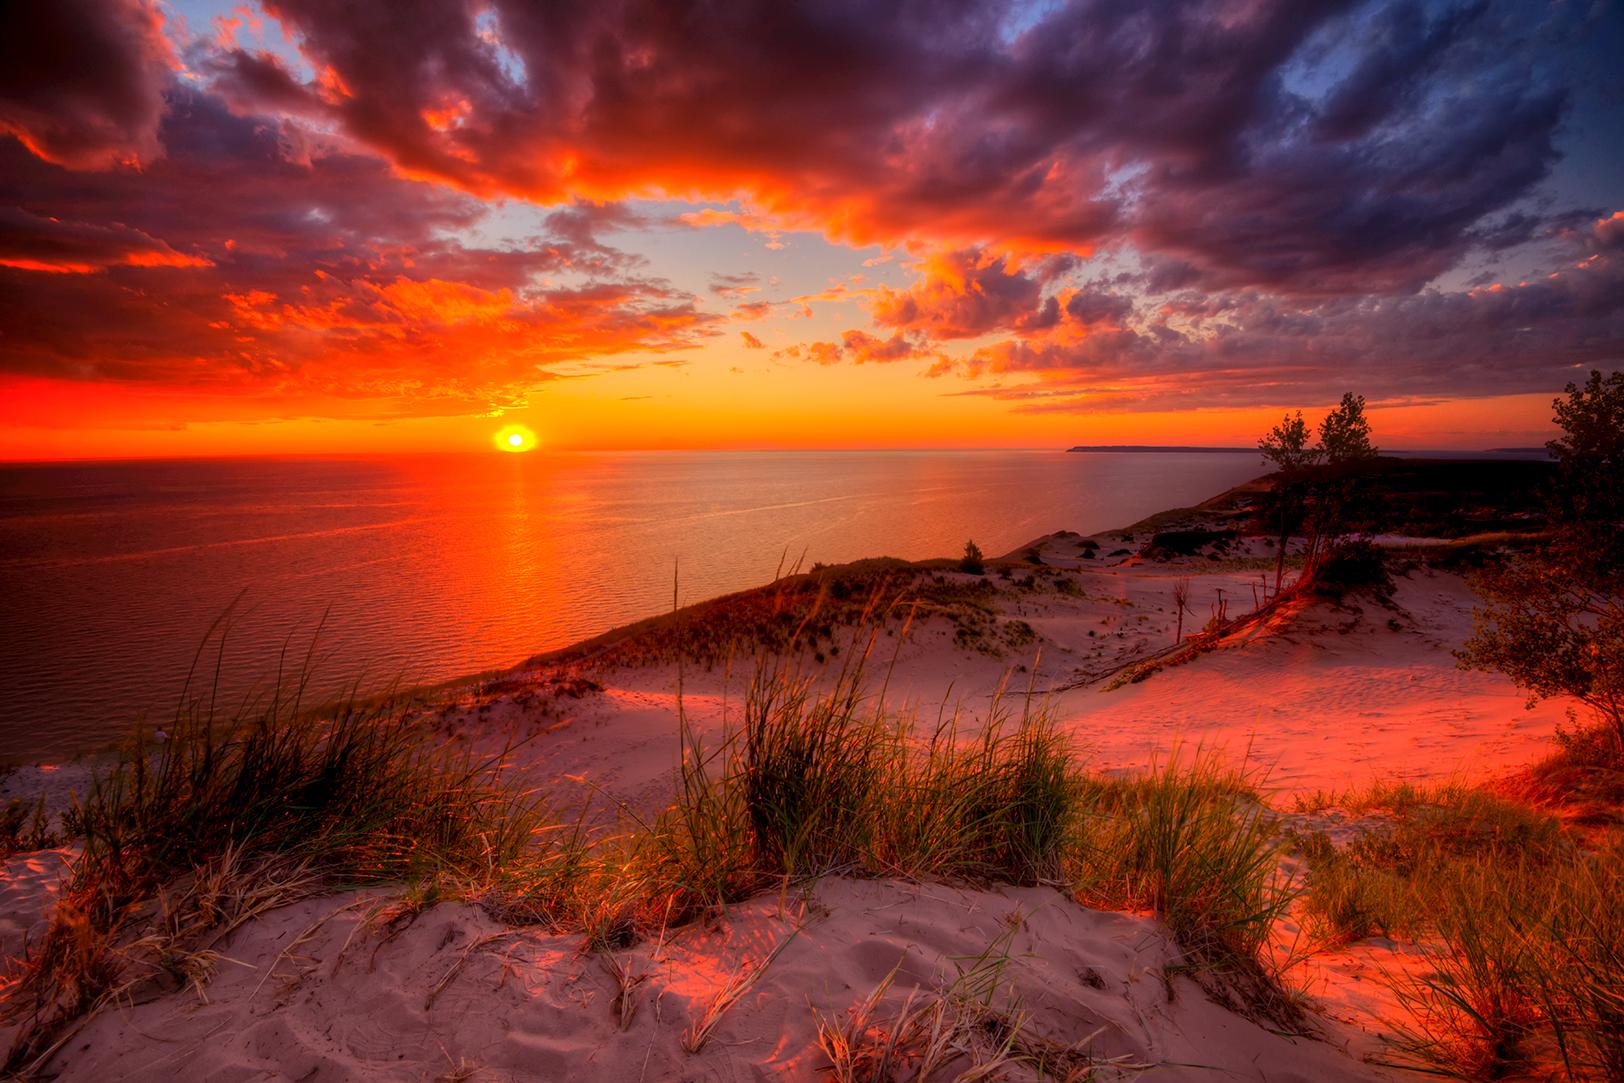 MI15-0632-0611 Dunes Sunset Storm by Aubrieta V Hope Michigan Scenery.jpg